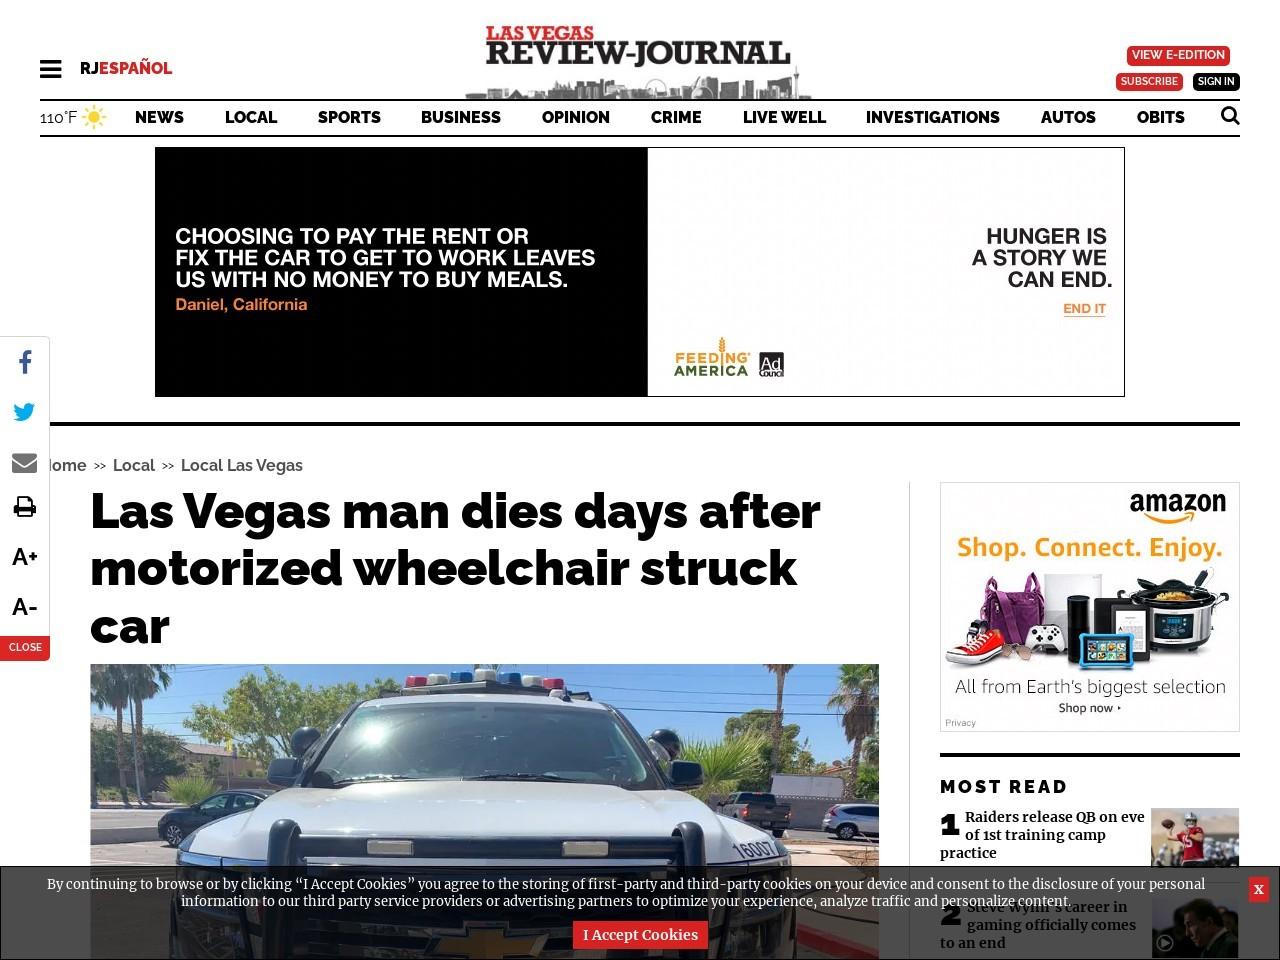 Las Vegas man dies days after motorized wheelchair struck car